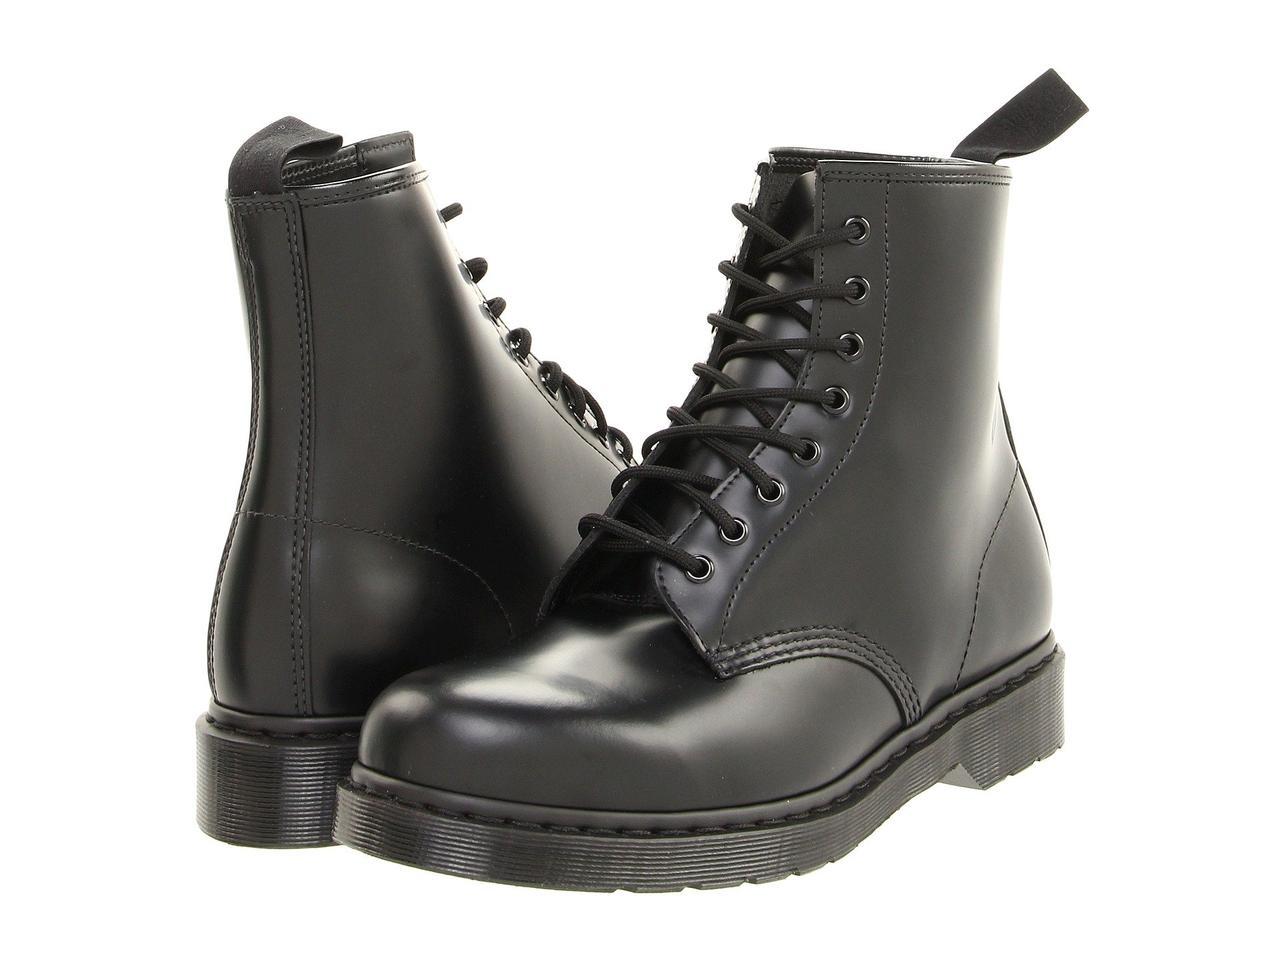 Ботинки Сапоги (Оригинал) Dr. Martens 1460 8-Tie Boot Black Smooth ... ef0d160646c7e